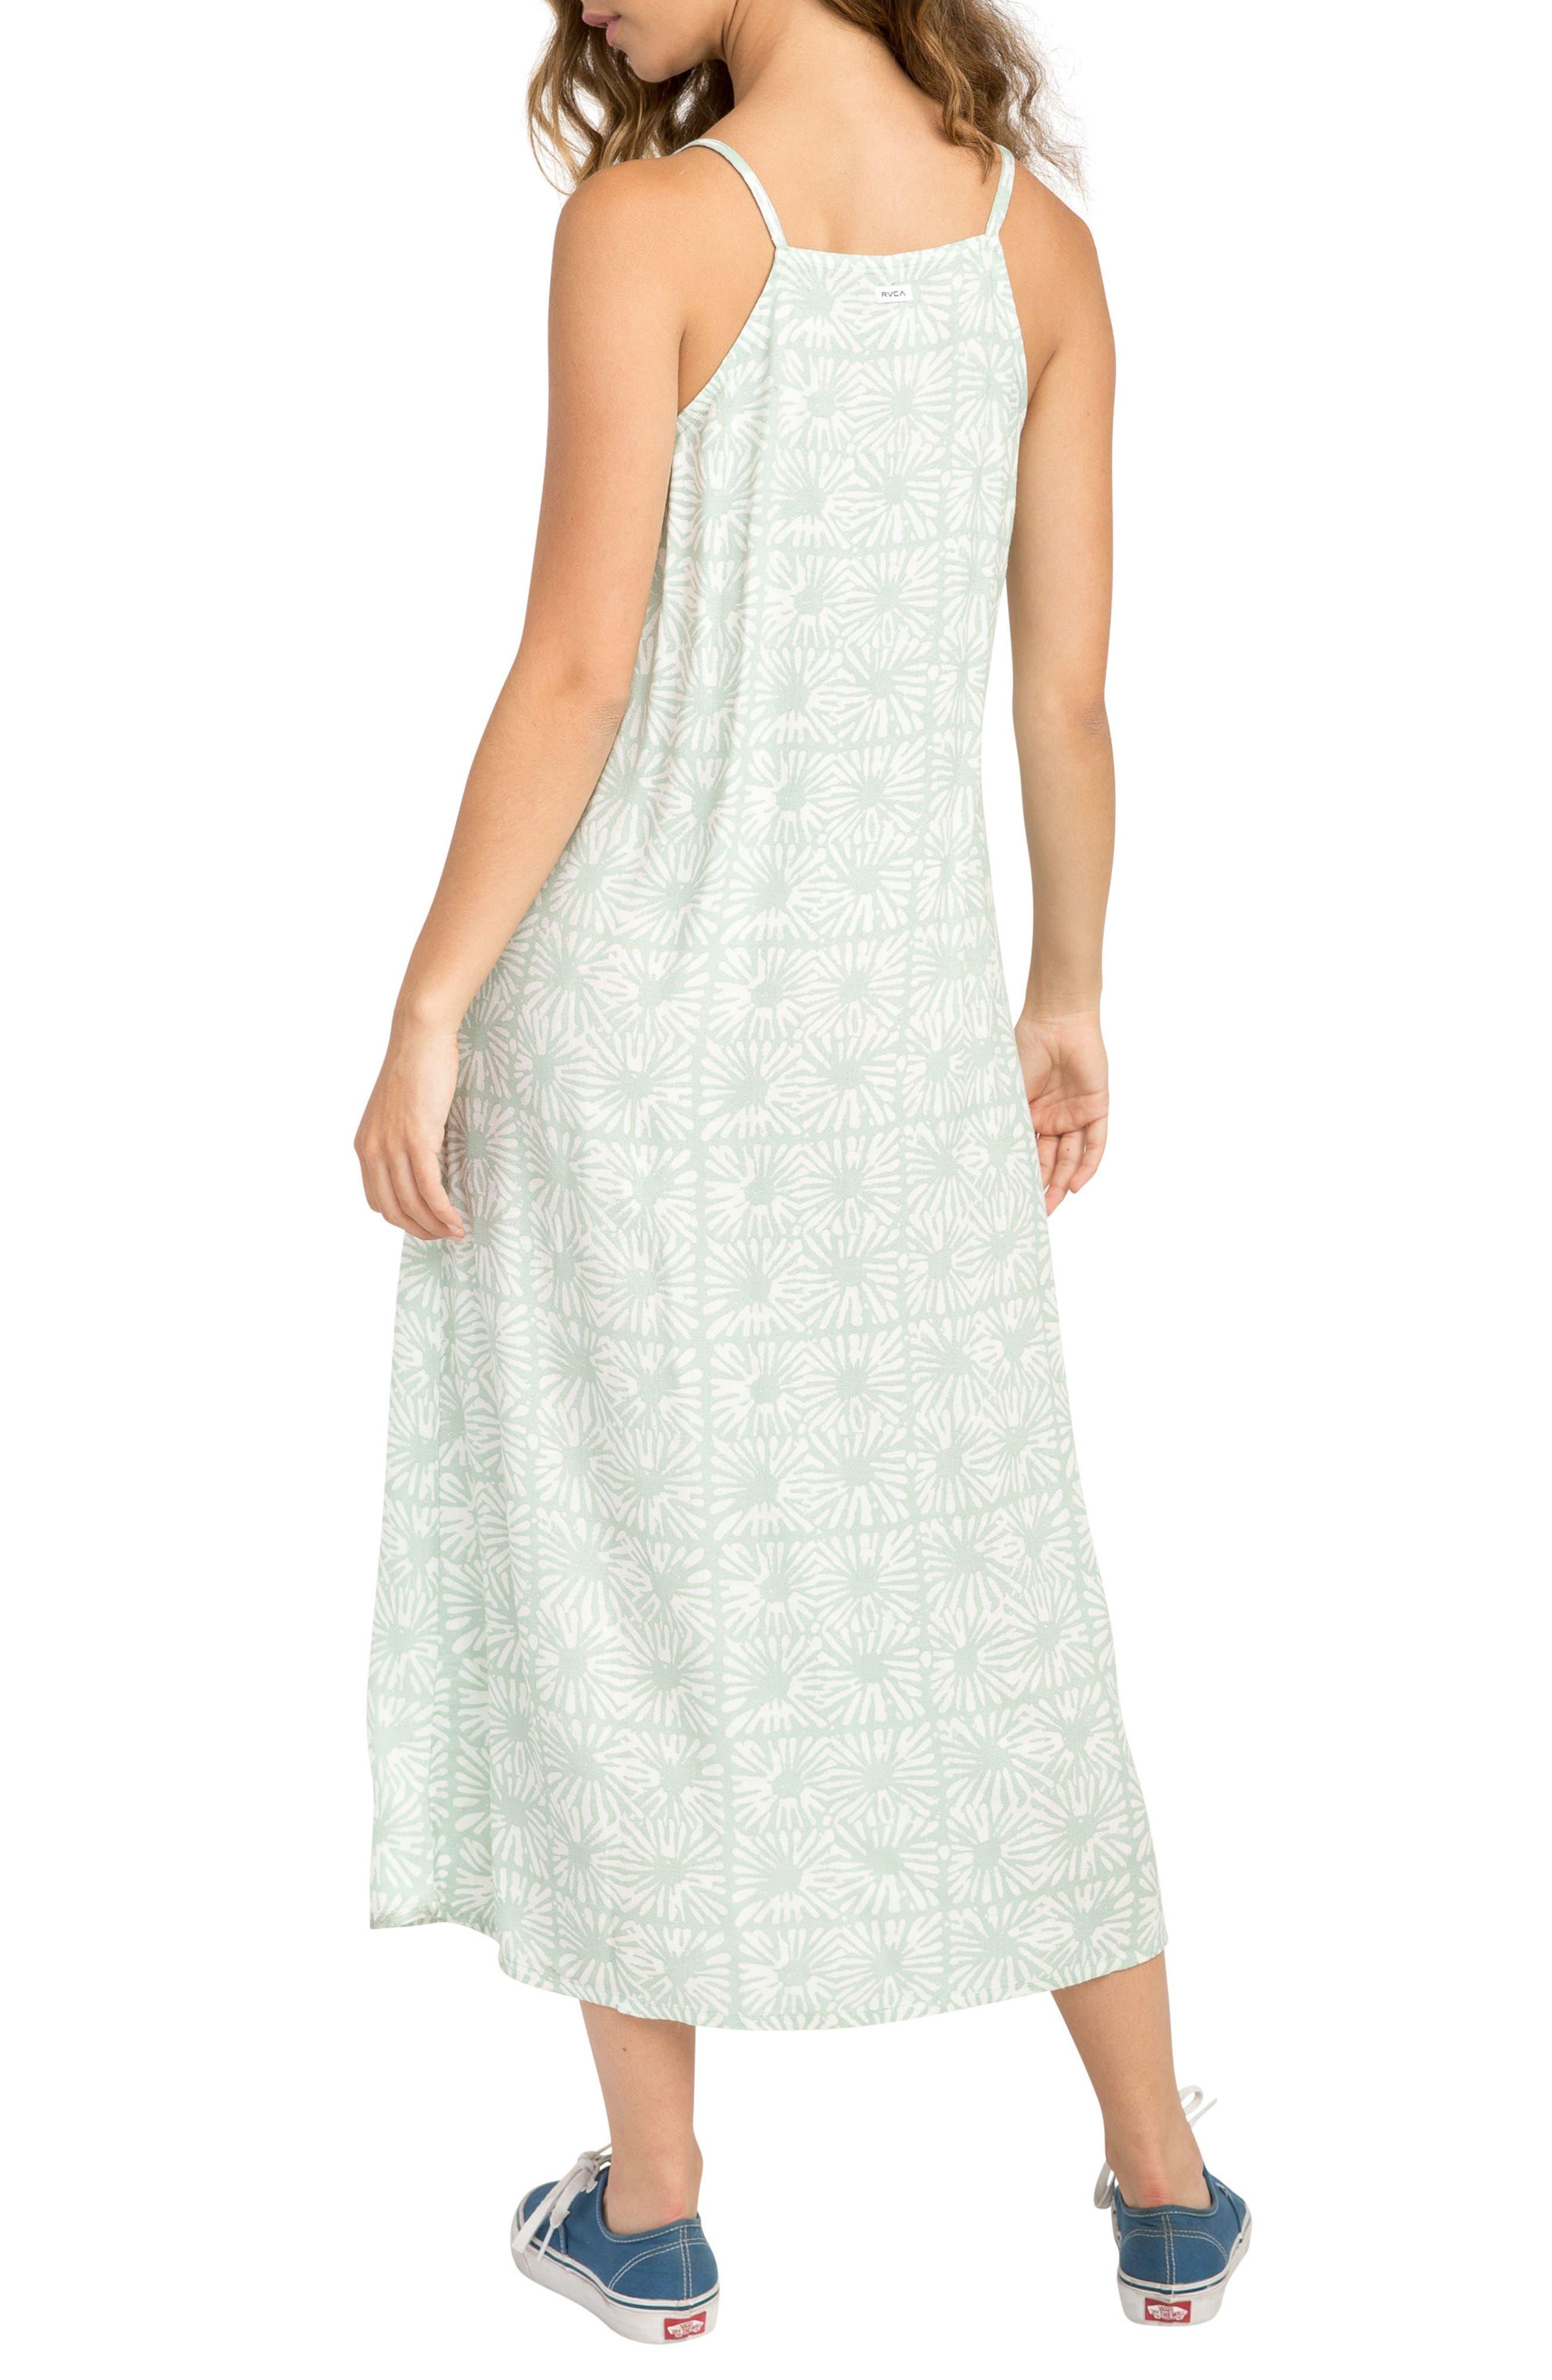 Garland Print Midi Dress,                             Alternate thumbnail 2, color,                             340